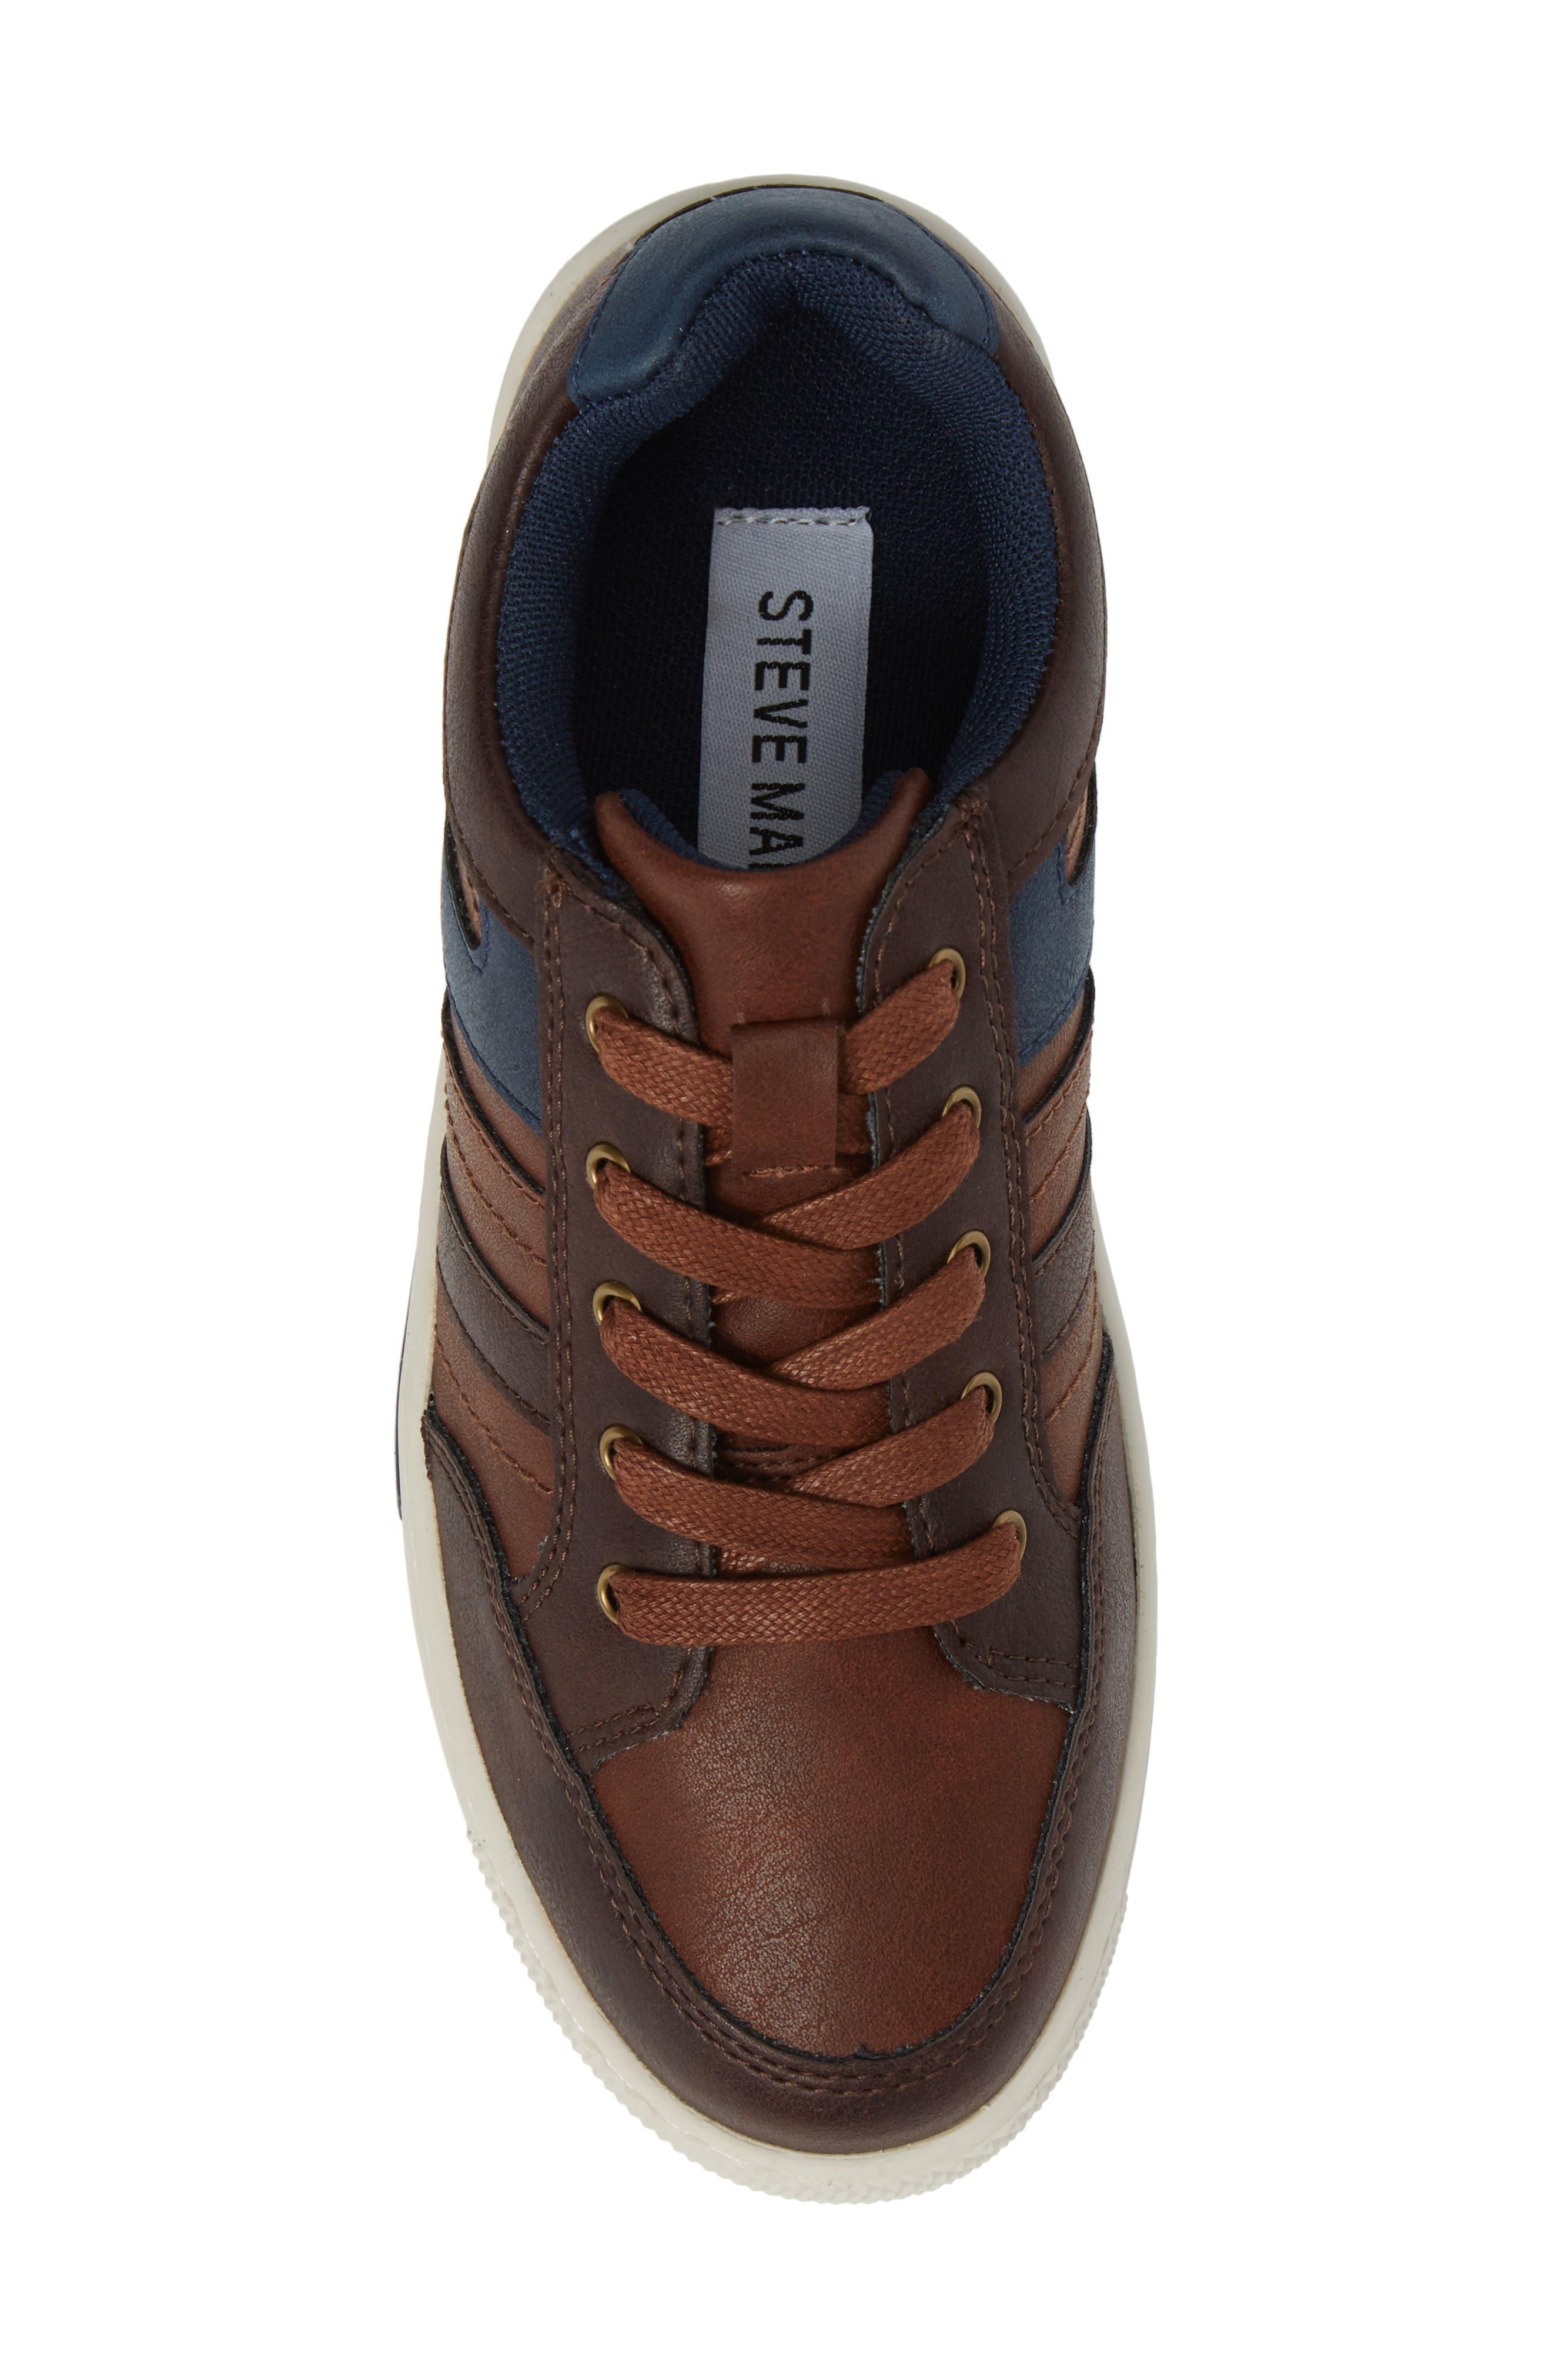 Trakk Sneaker,                             Alternate thumbnail 5, color,                             Brown Multi